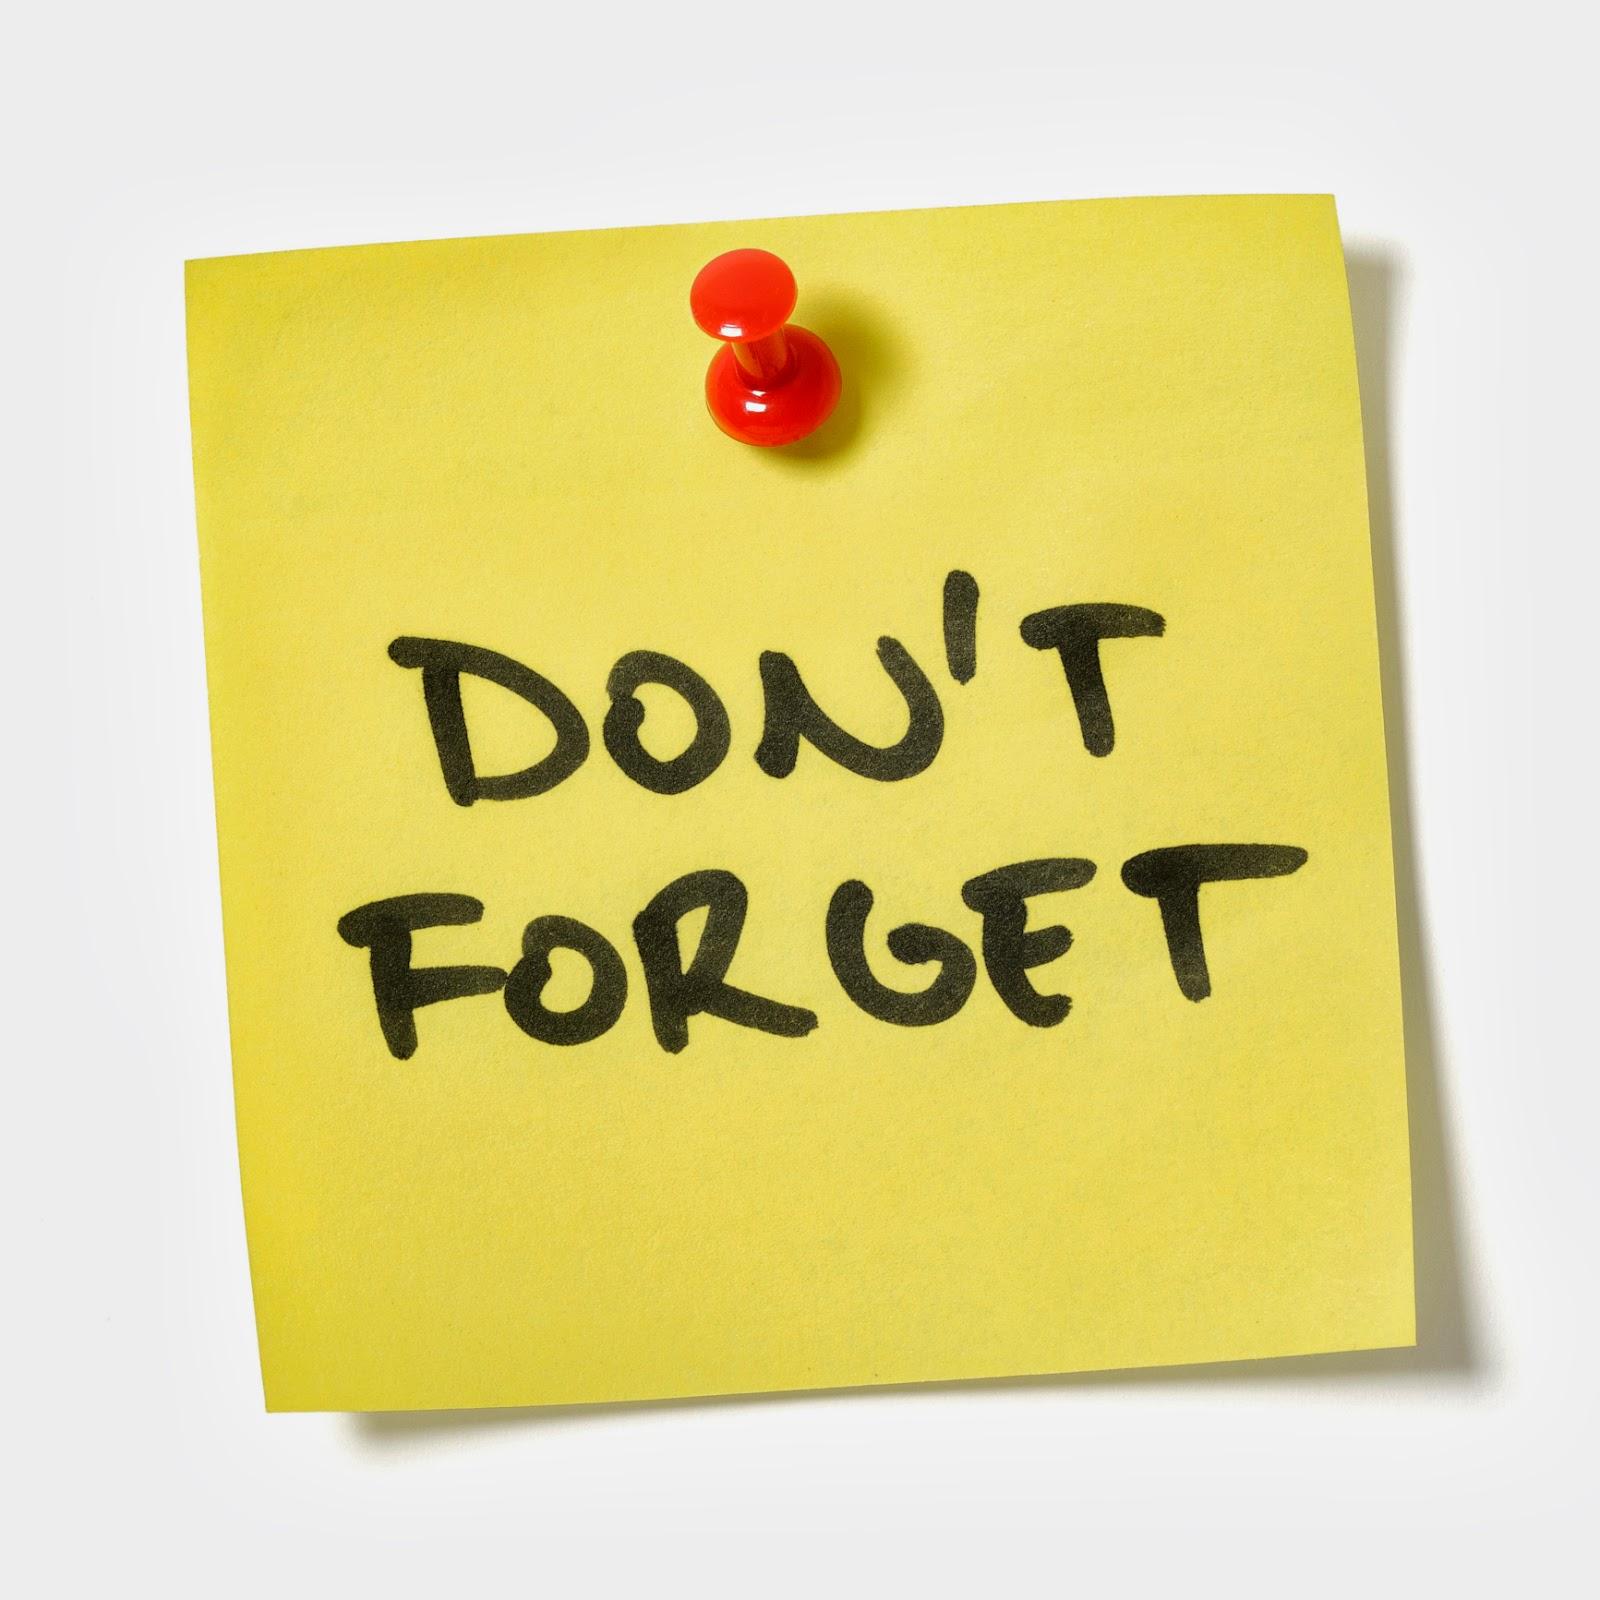 ELIfe: Reminder--Advising Week Begins Today!